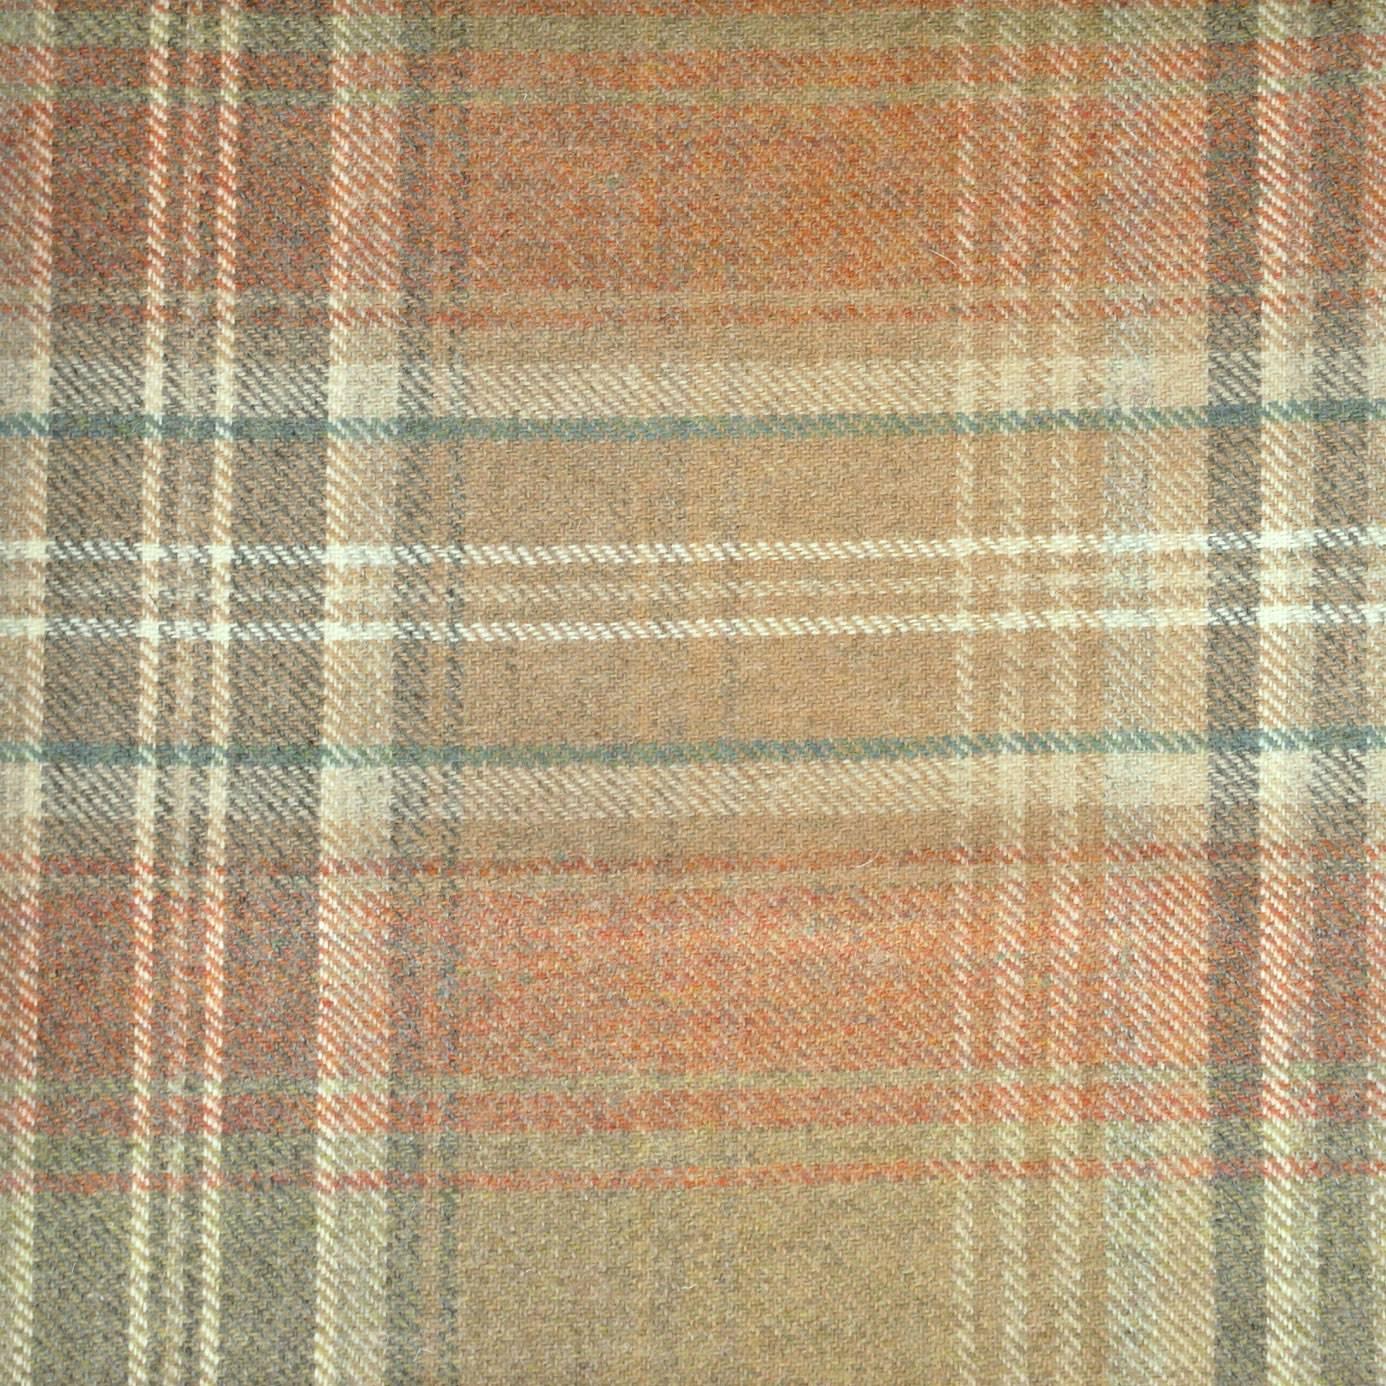 Balmoral Fabric Fired Earth N1004 Chess Highland